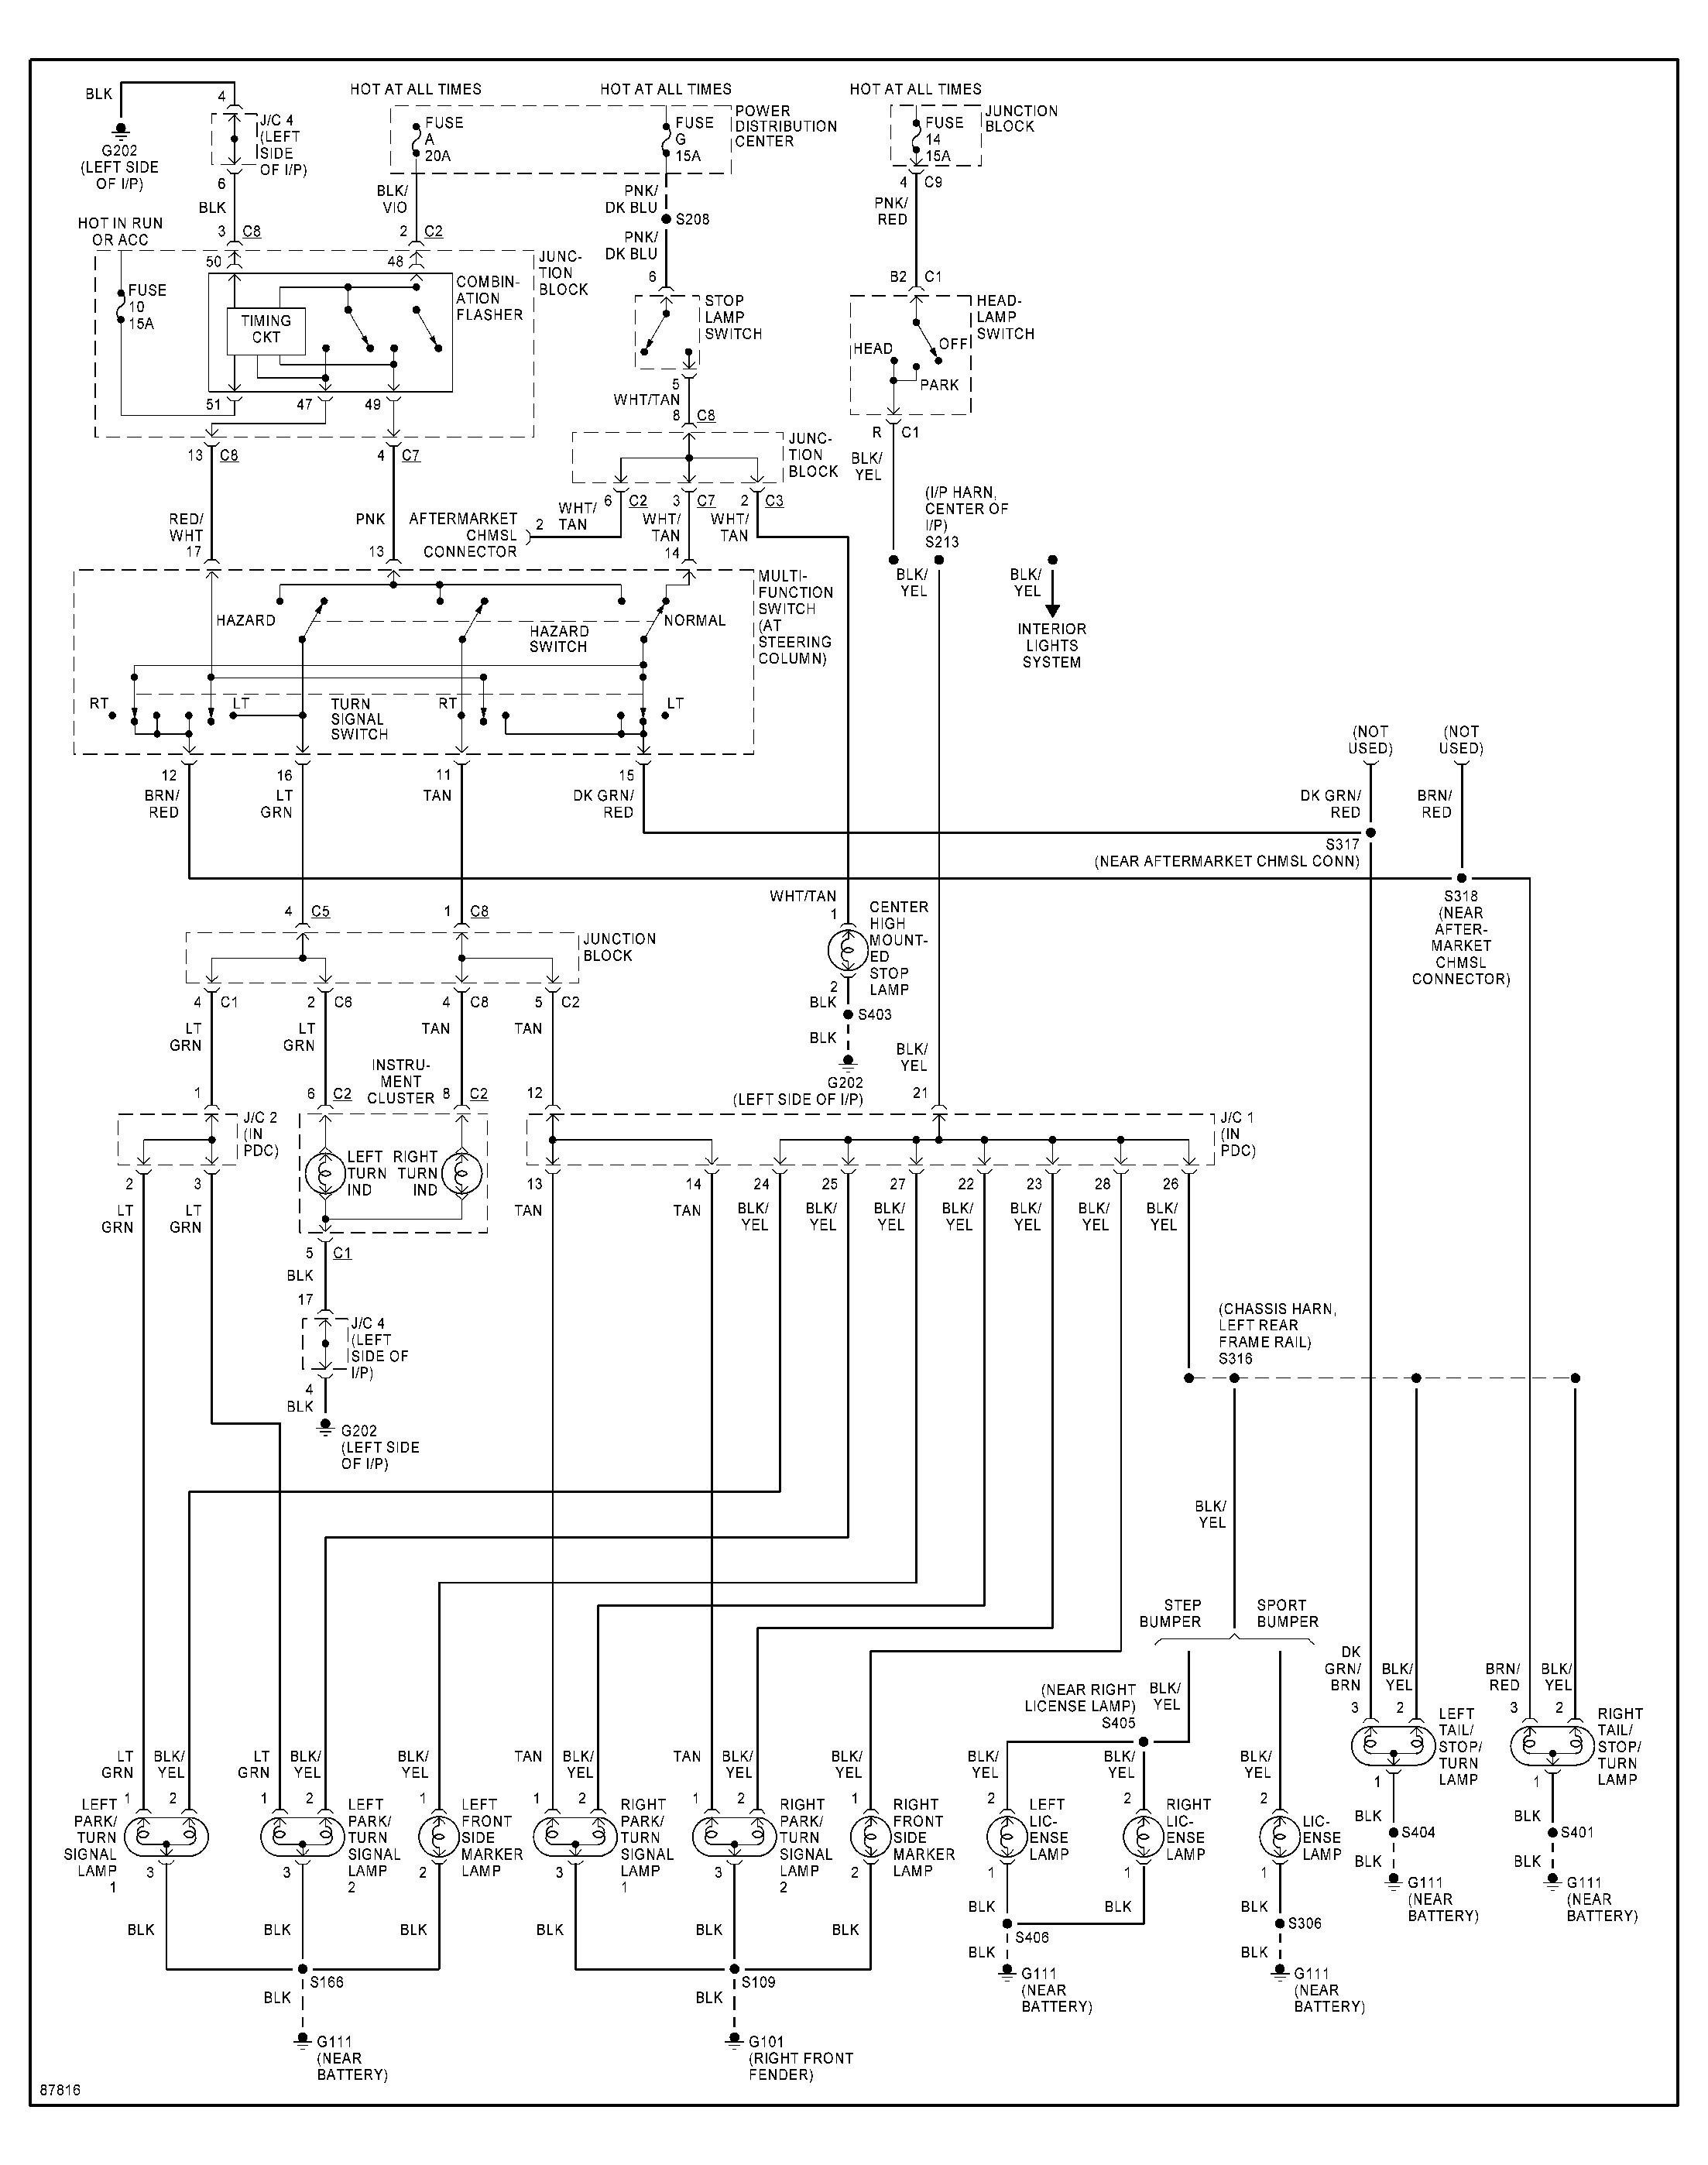 [SCHEMATICS_4PO]  2001 Sterling Wiring Diagram 1996 Dakota Fuse Diagram -  fahri-hamzah.kucing-garong-1.sardaracomunitaospitale.it | 2007 Sterling Wiring Diagram |  | Wiring Diagram and Schematics